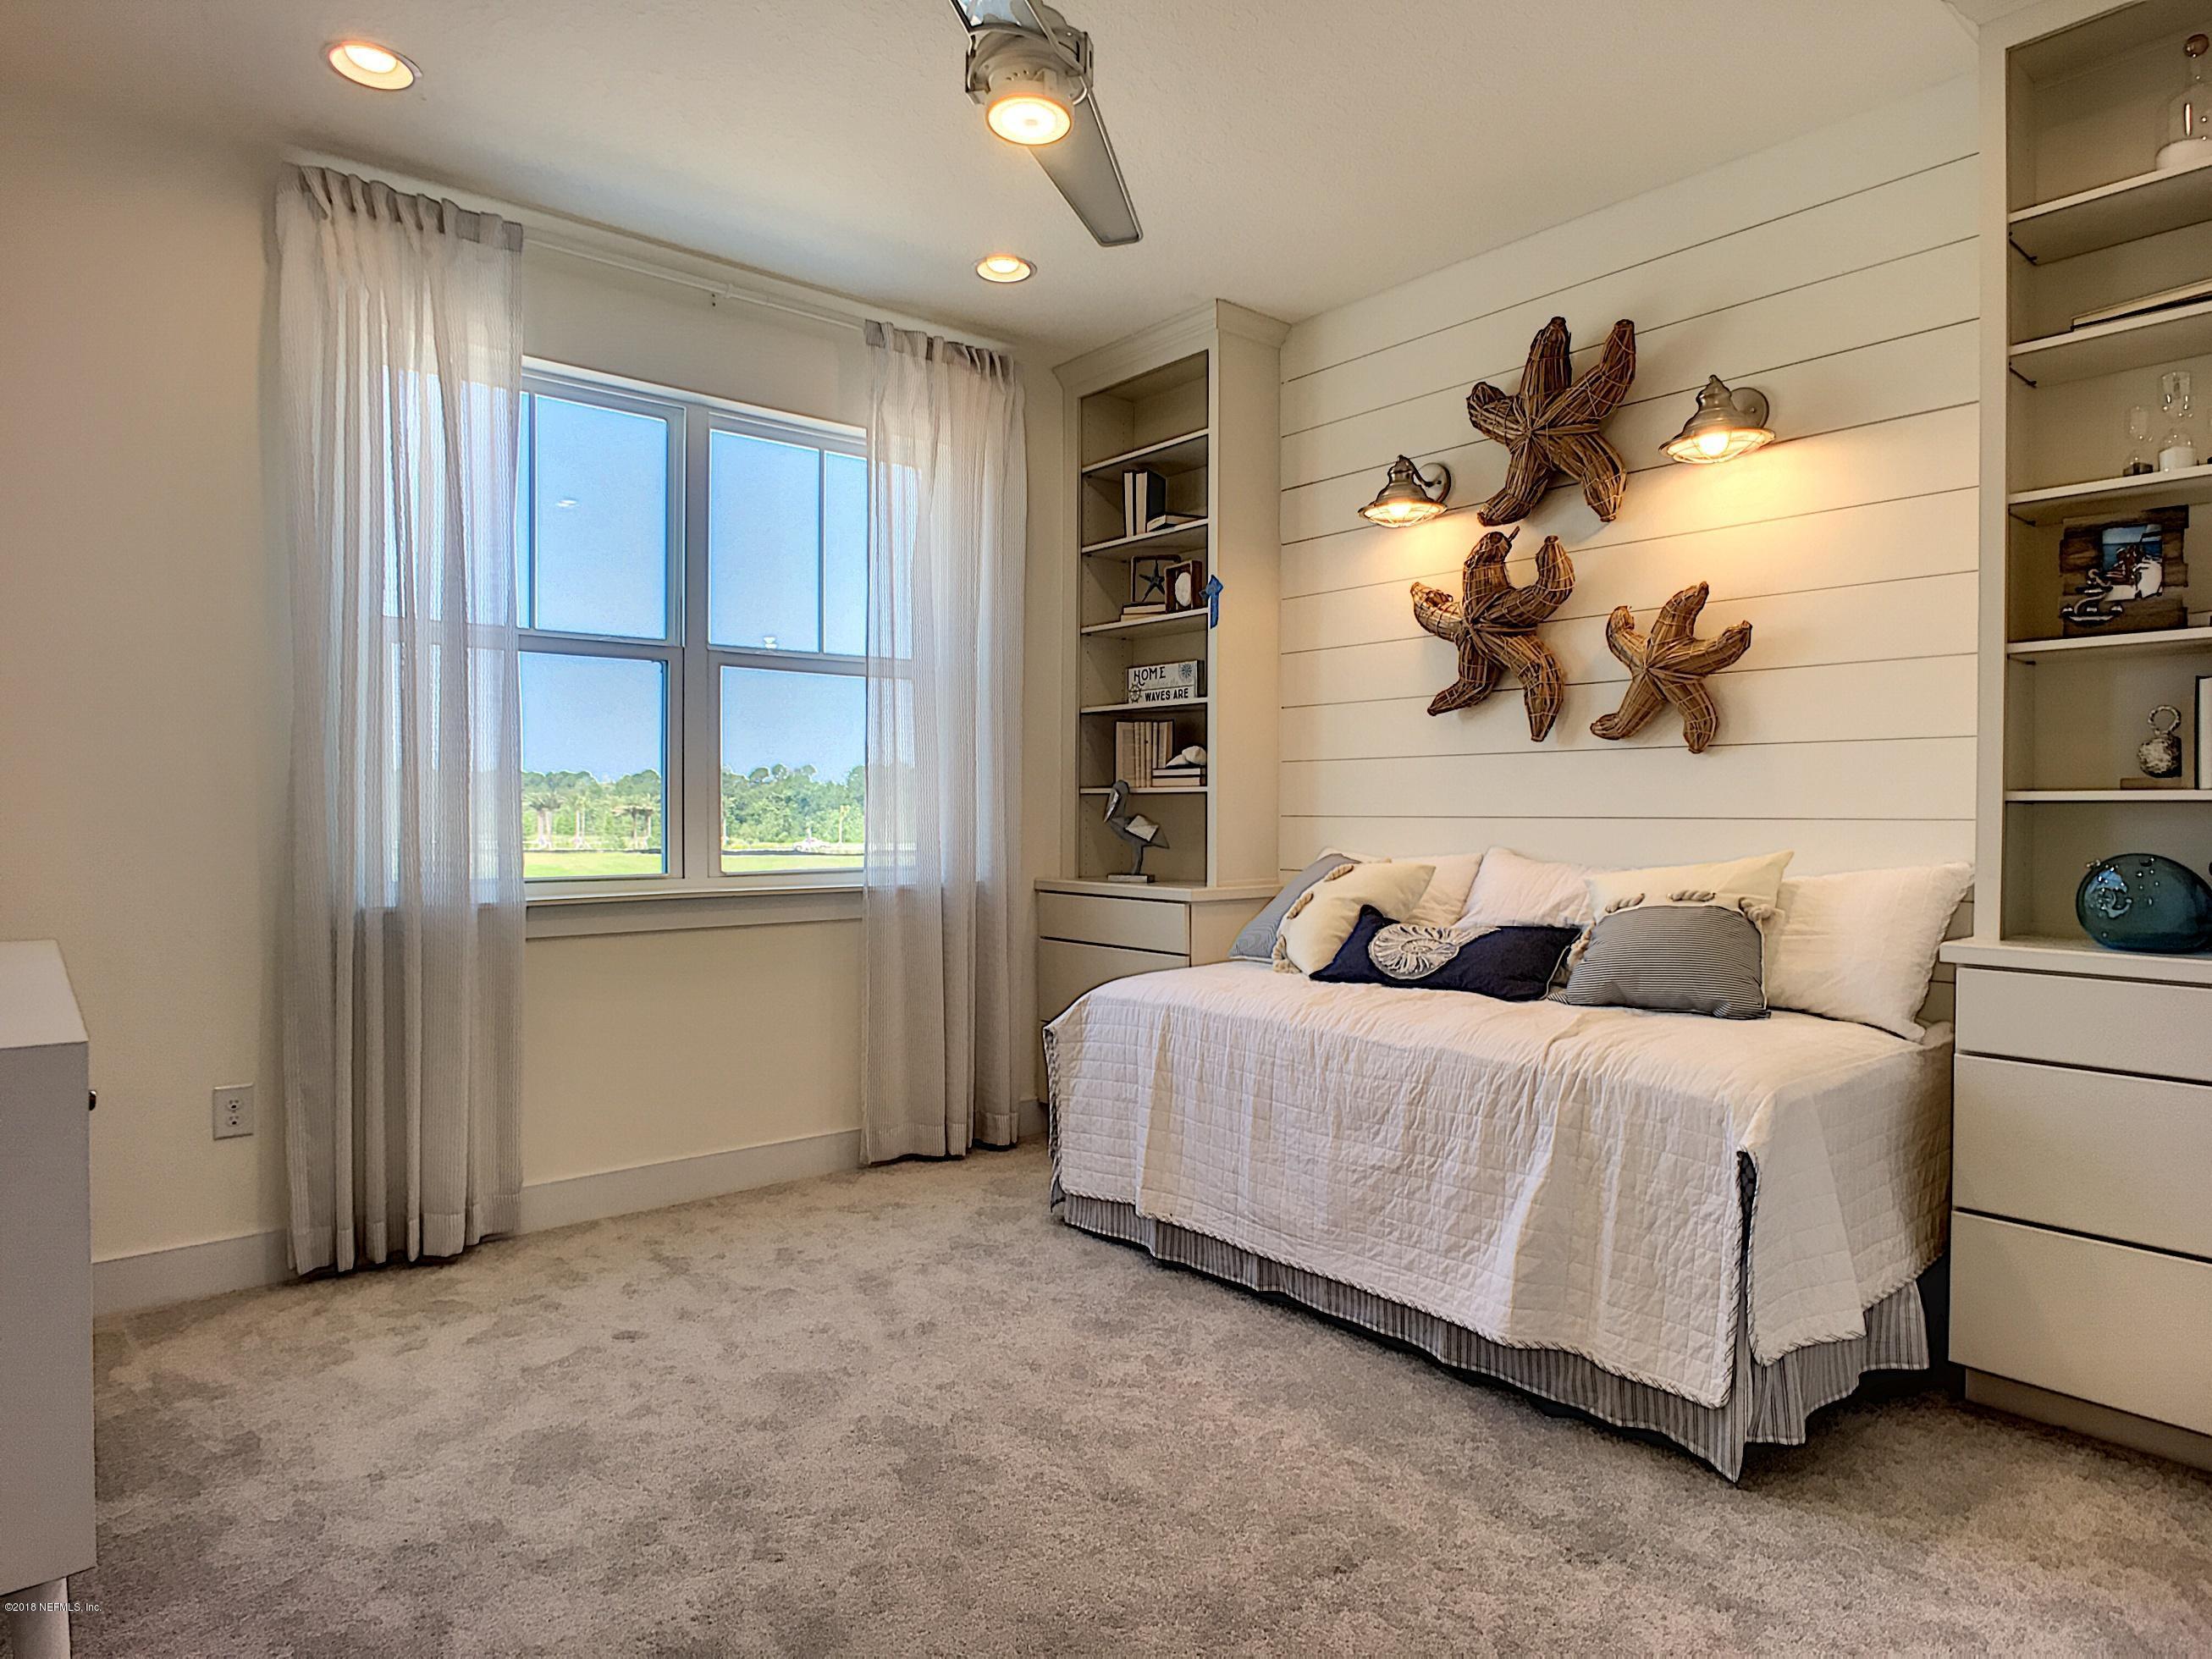 253 RUM RUNNER, ST JOHNS, FLORIDA 32259, 3 Bedrooms Bedrooms, ,2 BathroomsBathrooms,Residential - townhome,For sale,RUM RUNNER,953566